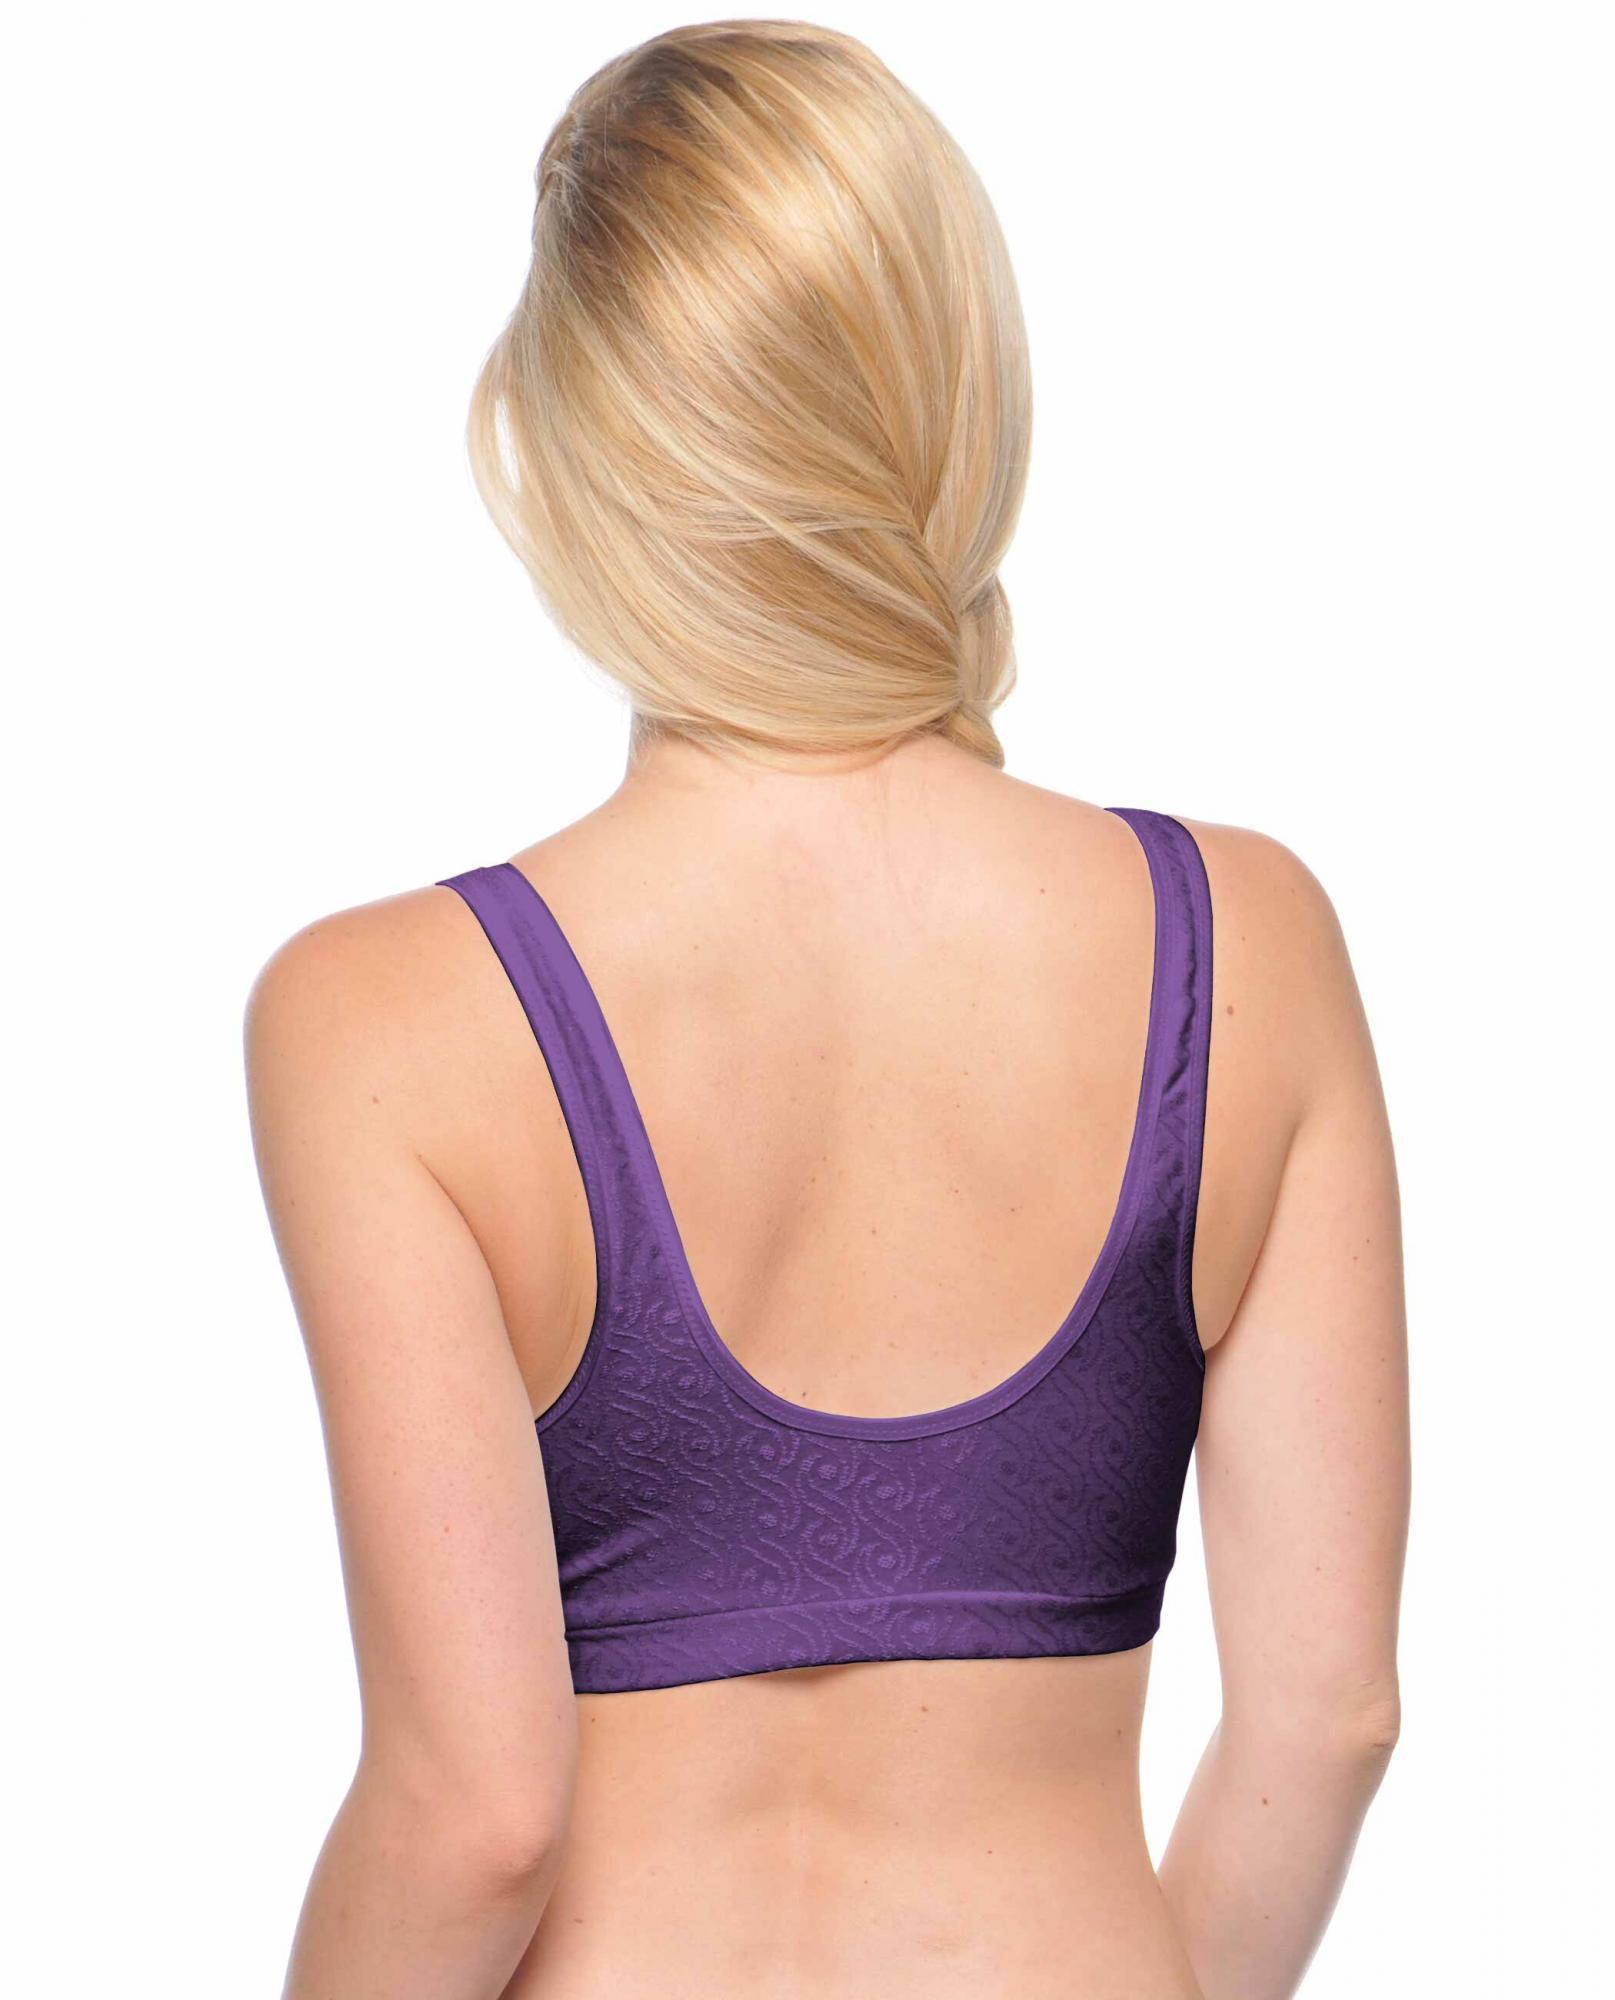 melinda-g-dreamy-sleep-nursing-bra-2188-purple-back.jpg